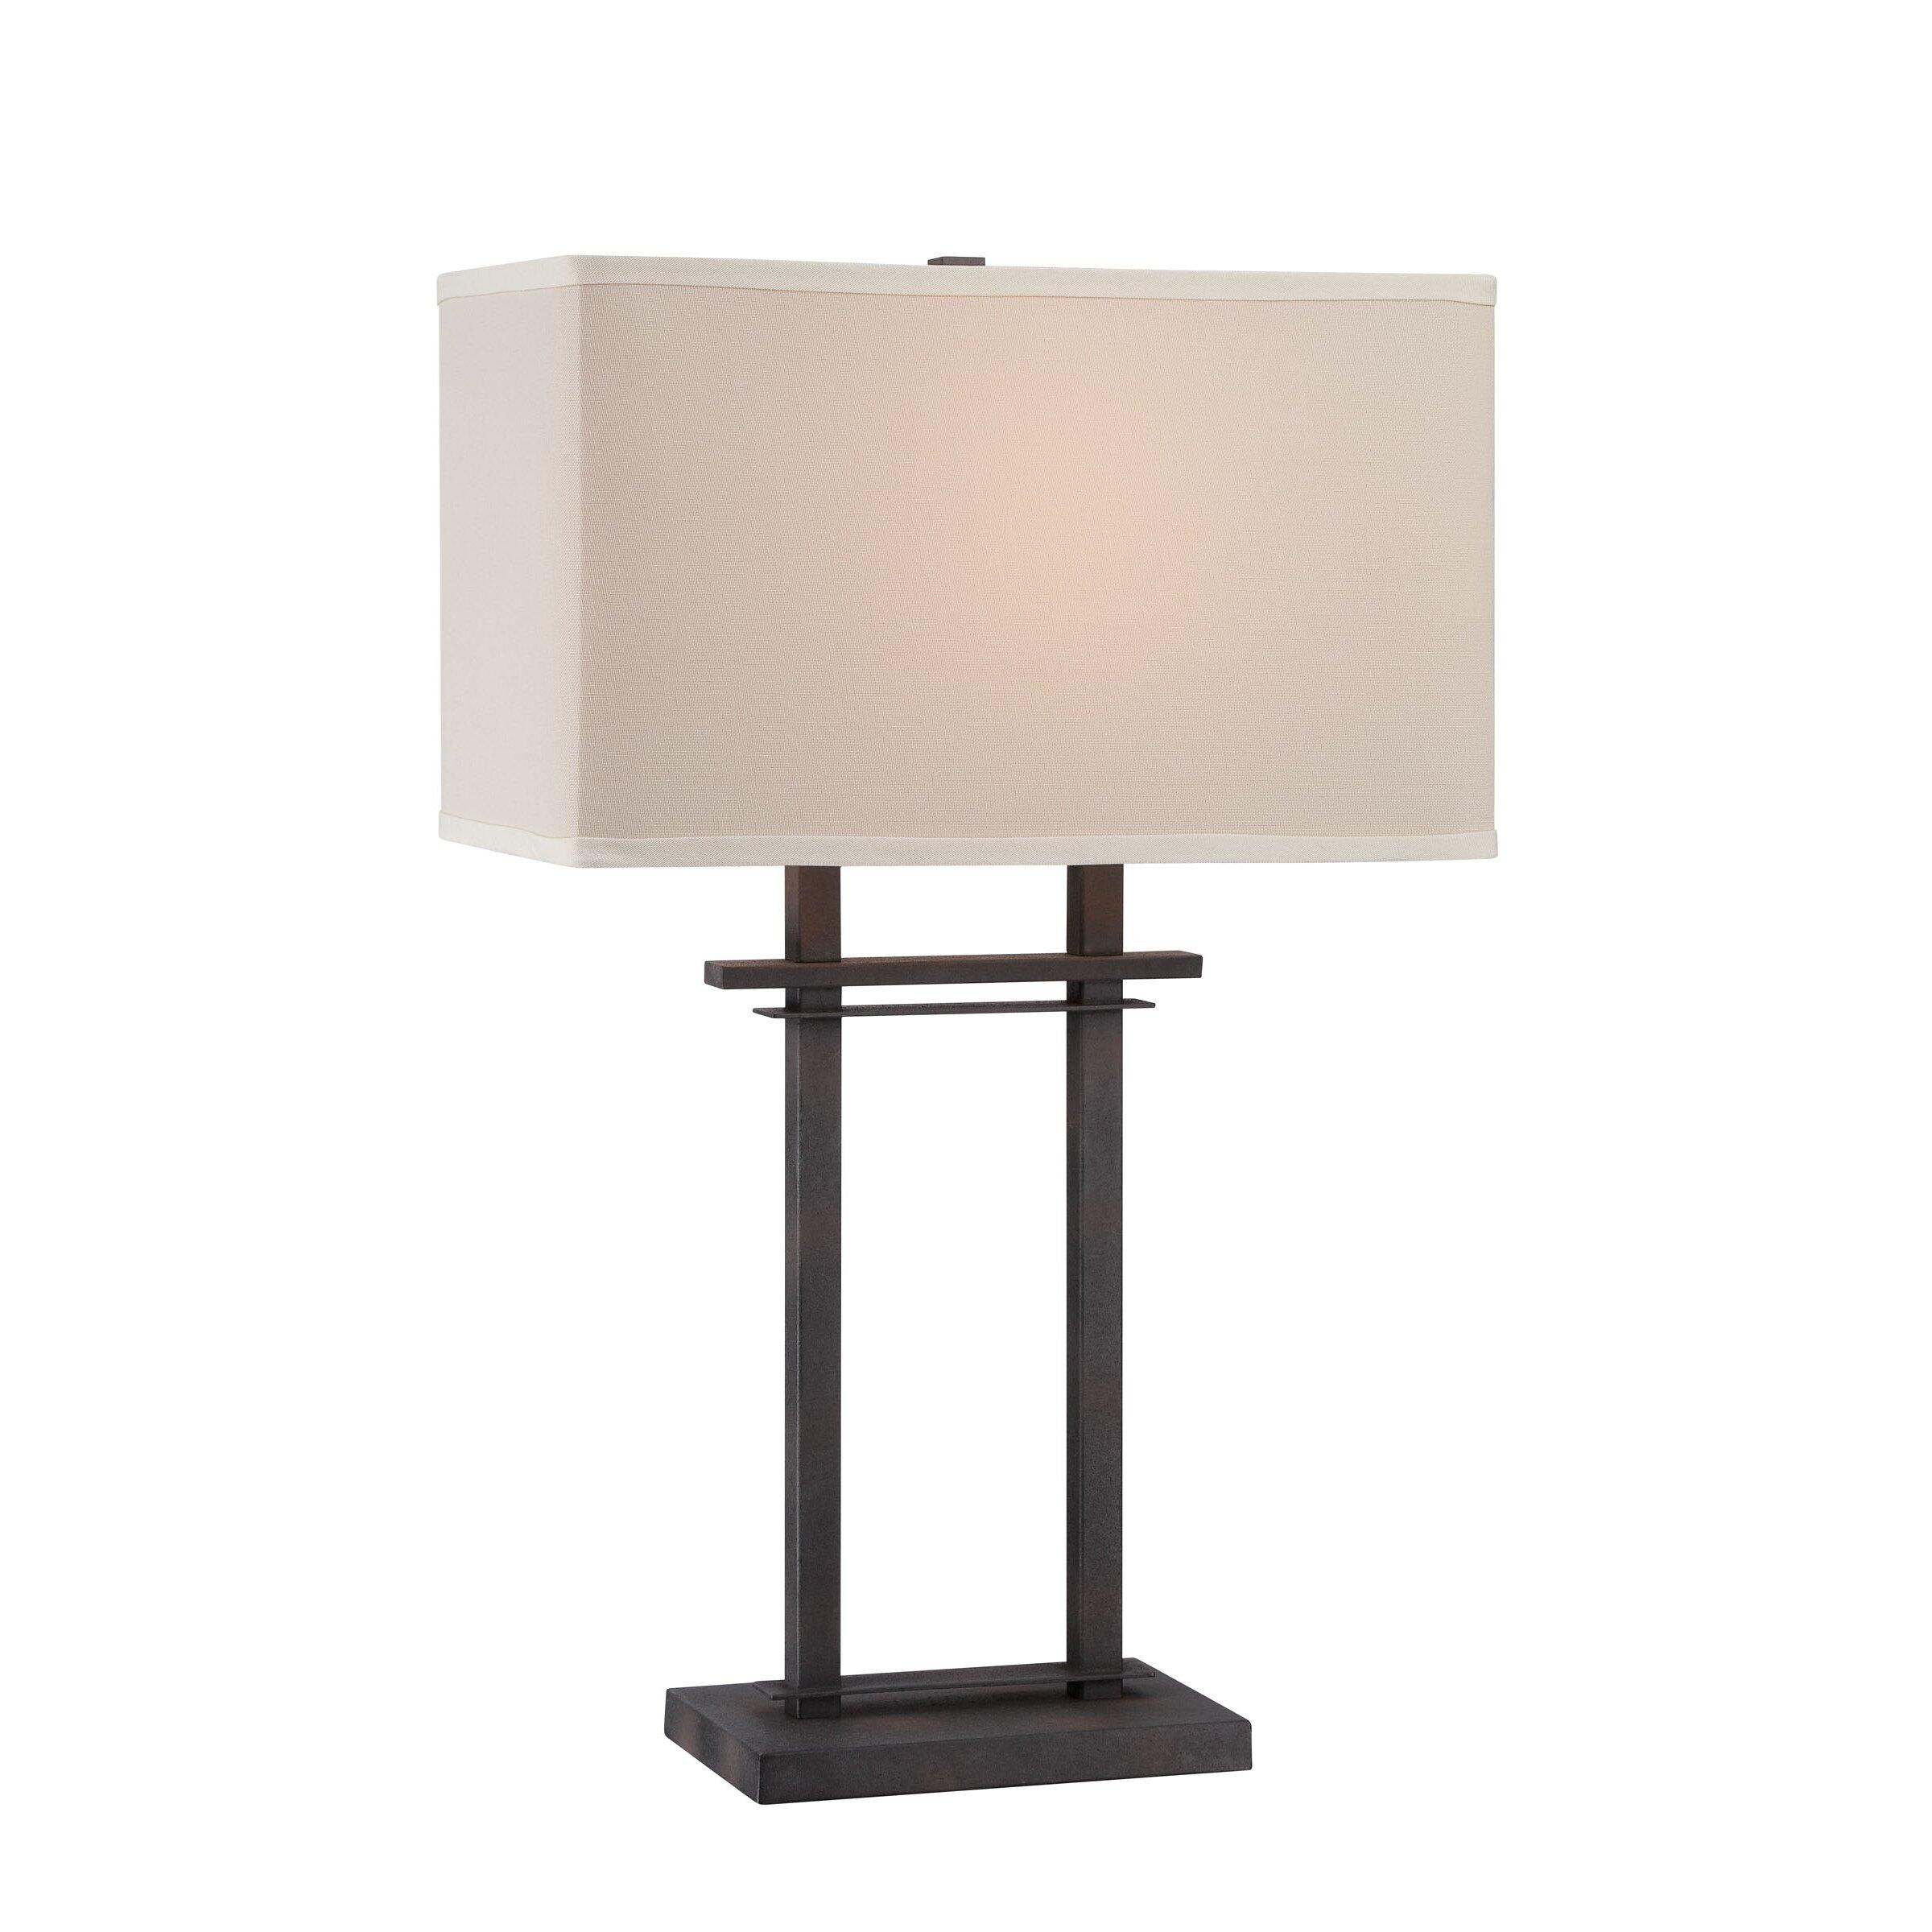 lighting lamps table lamps latitude run sku ltrn1891. Black Bedroom Furniture Sets. Home Design Ideas